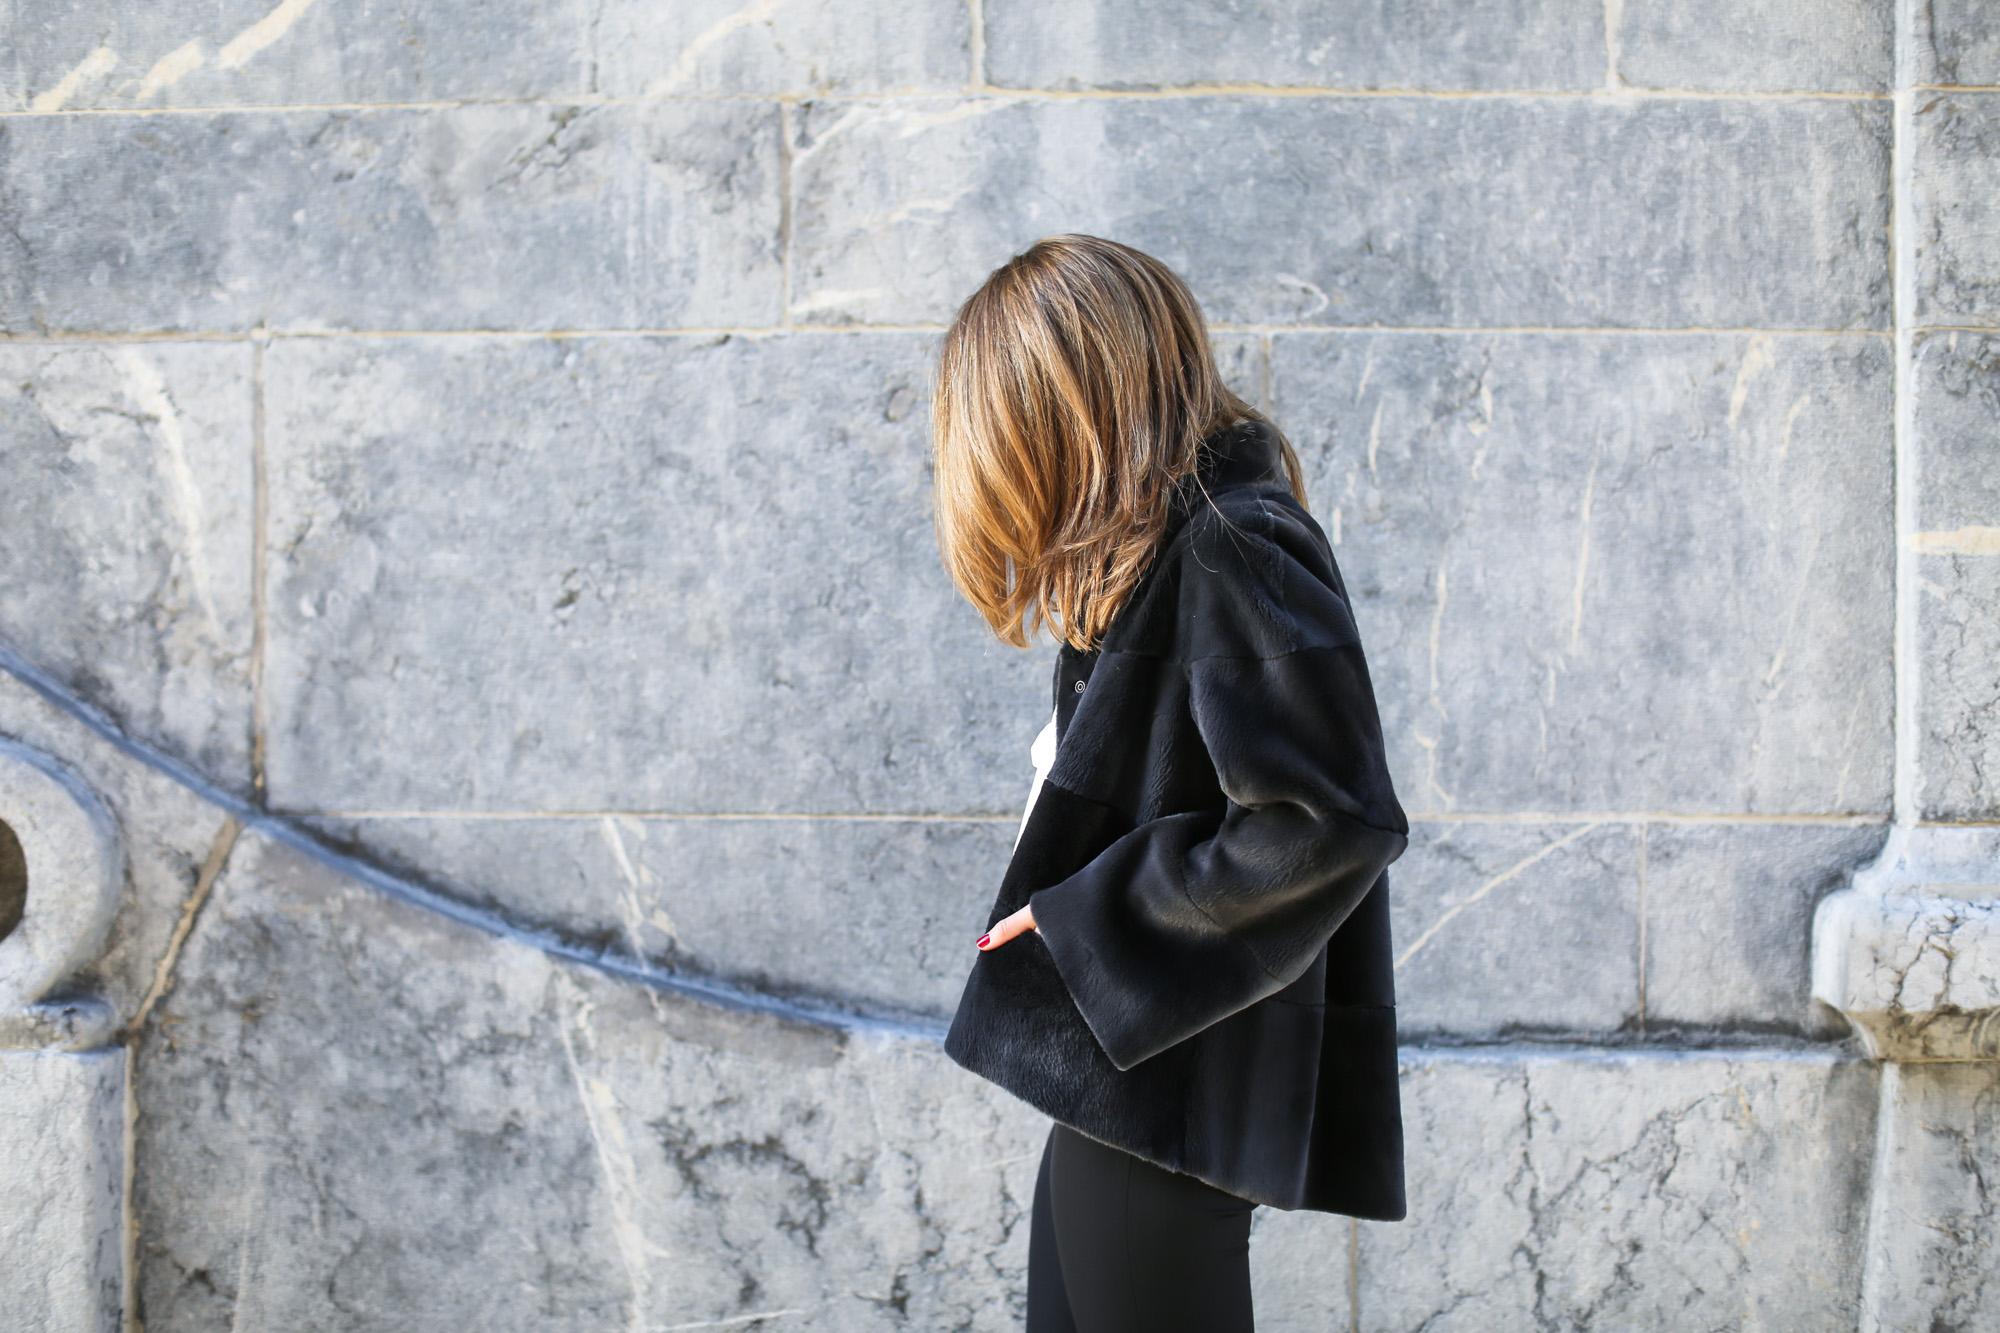 Clochet_streetstyle_cropped_flared_trousers_boxcalf_jacket_kalam_bilbao-10